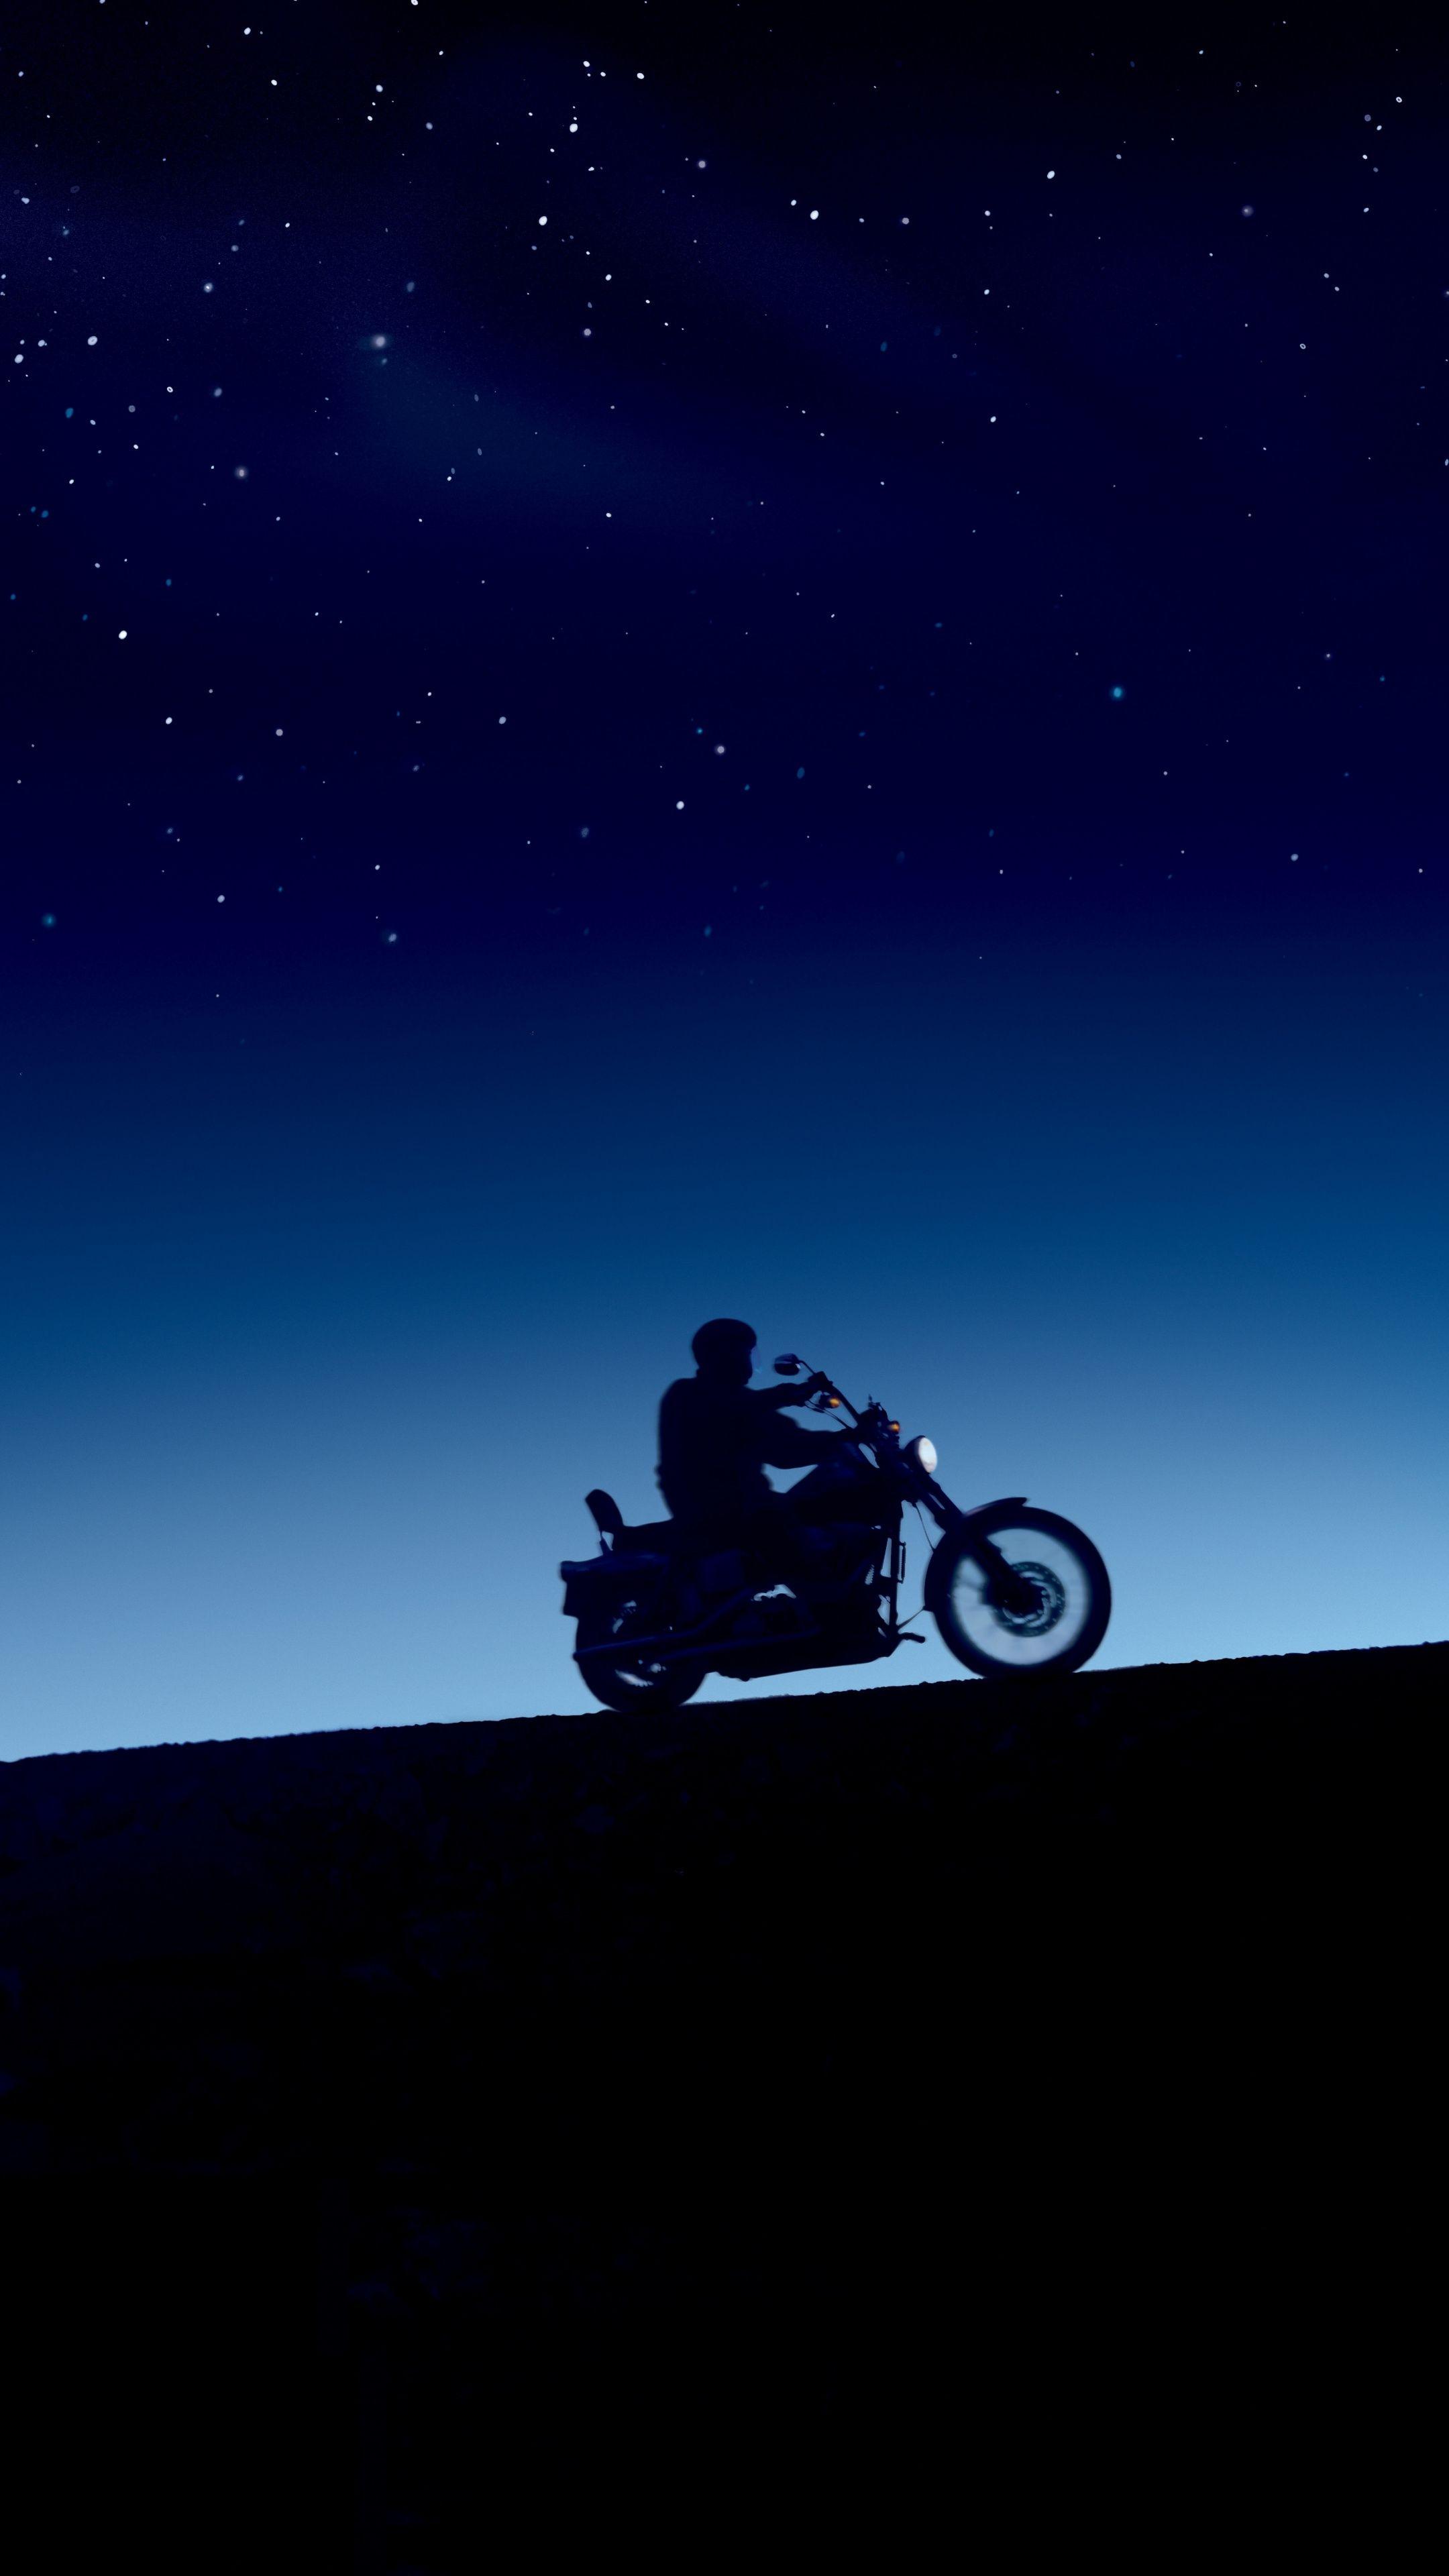 2160x3840 Evening, bike ride, silhouette, sunset wallpaper